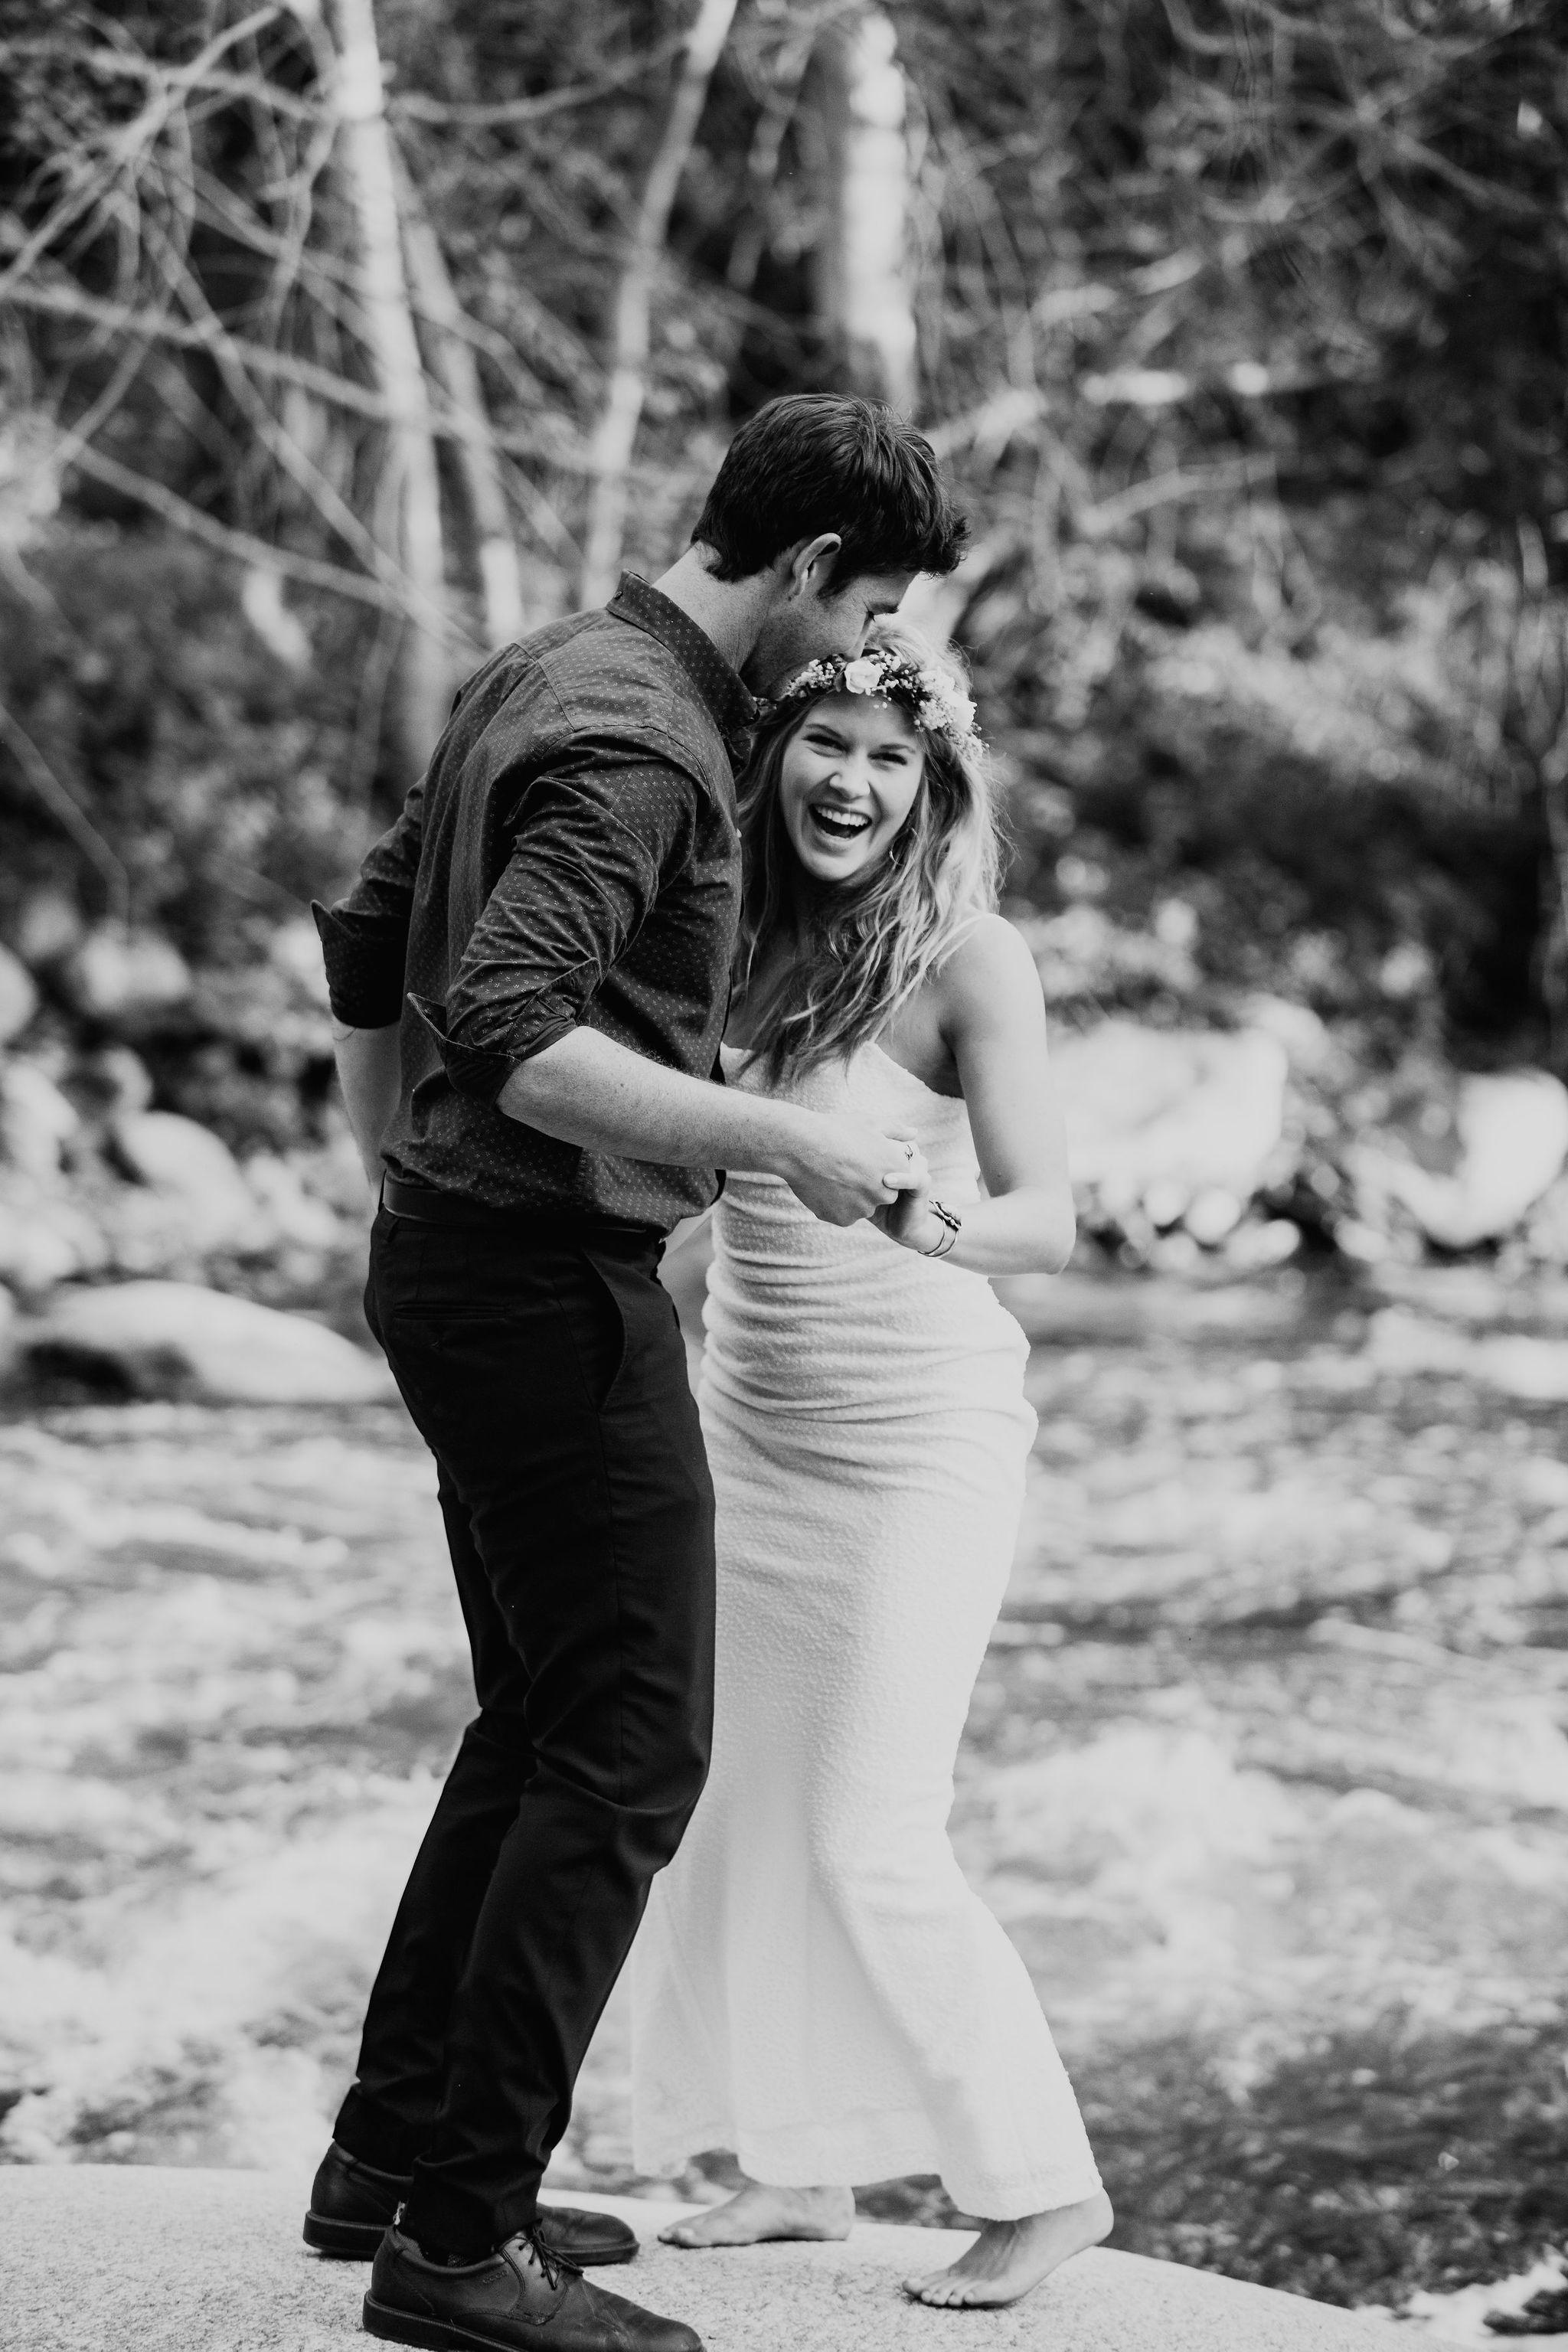 RedwoodRanch_Geoff&LyndsiPhotography_Mike&Amanda_Romantics70.jpg